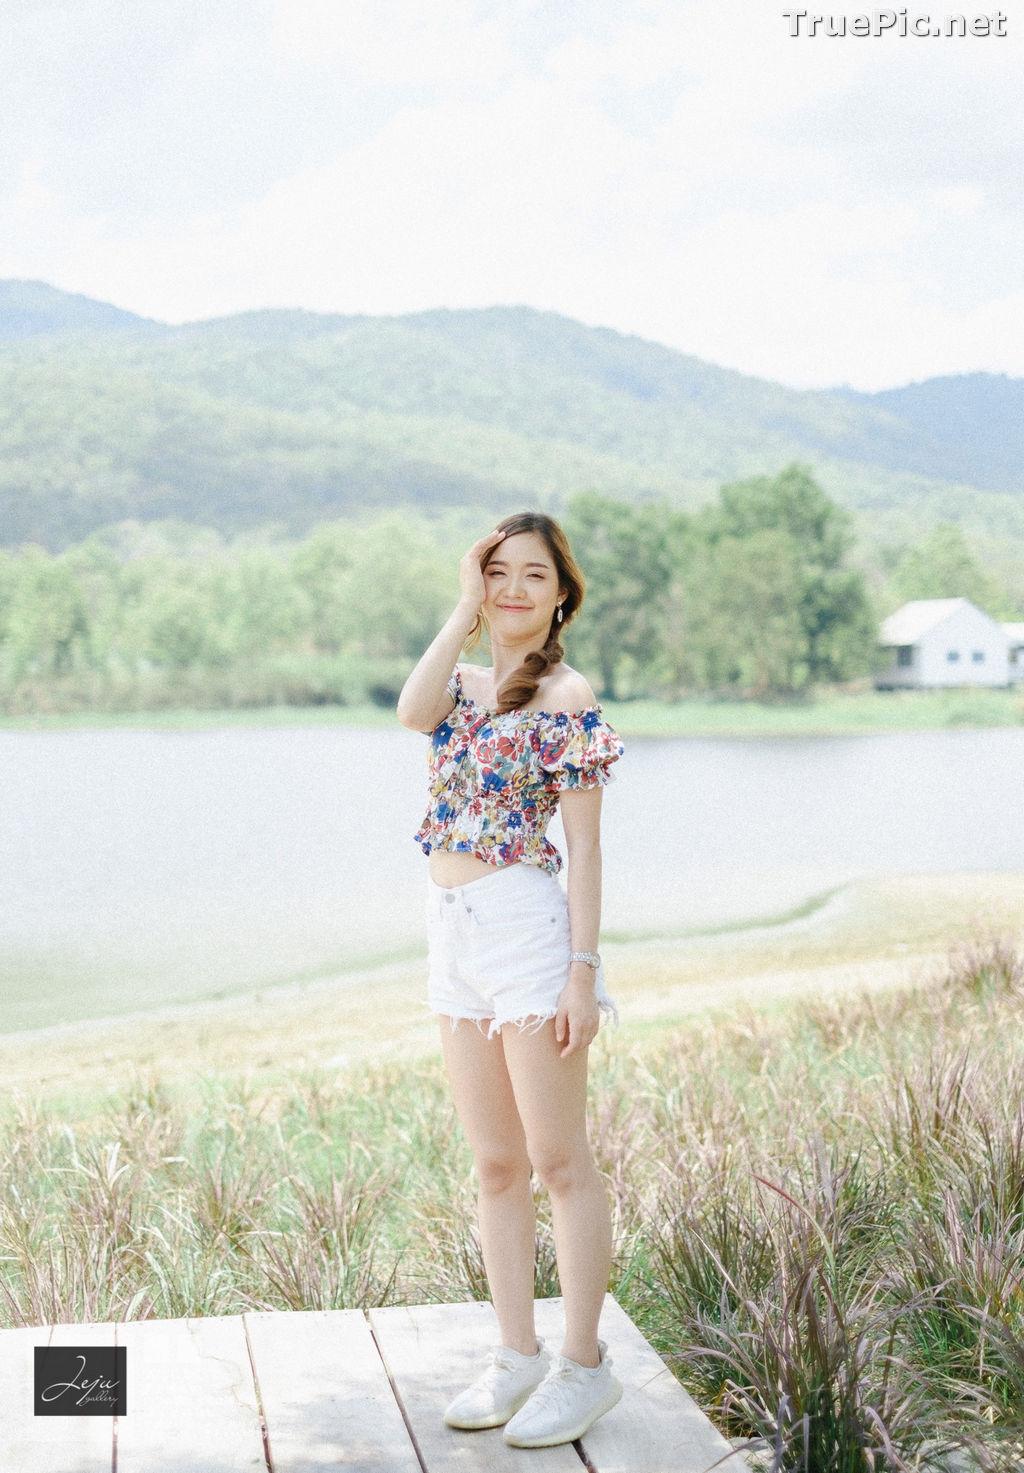 Image Thailand Beautiful Model - Viva Pongdechkajorn - Tetta Viva - TruePic.net - Picture-7